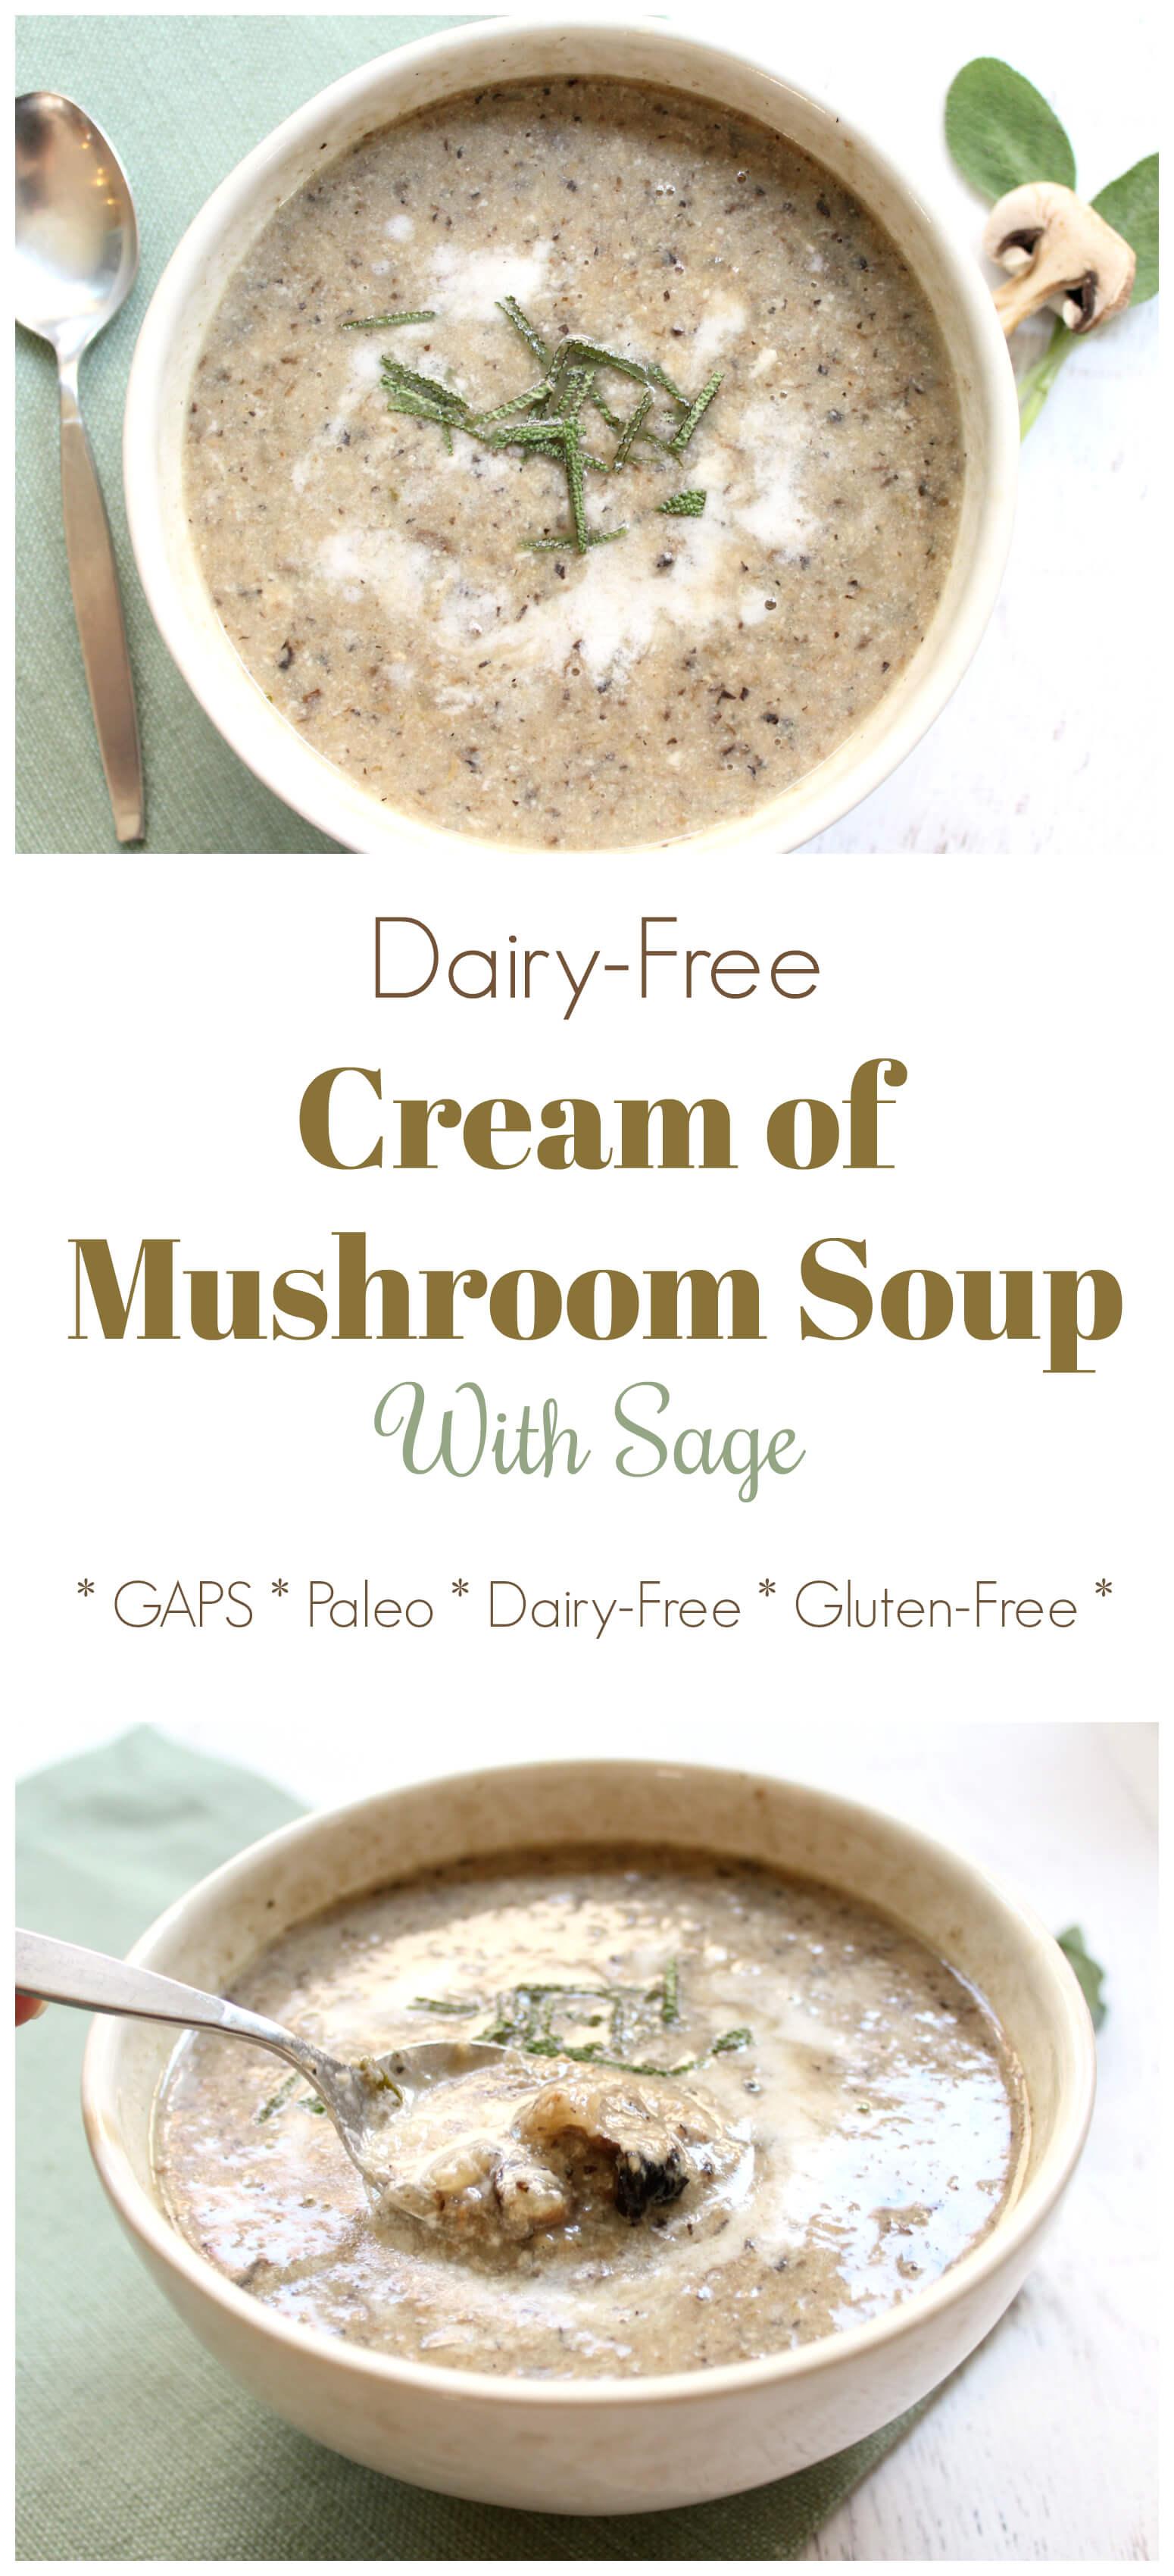 Mushroom soup gluten free